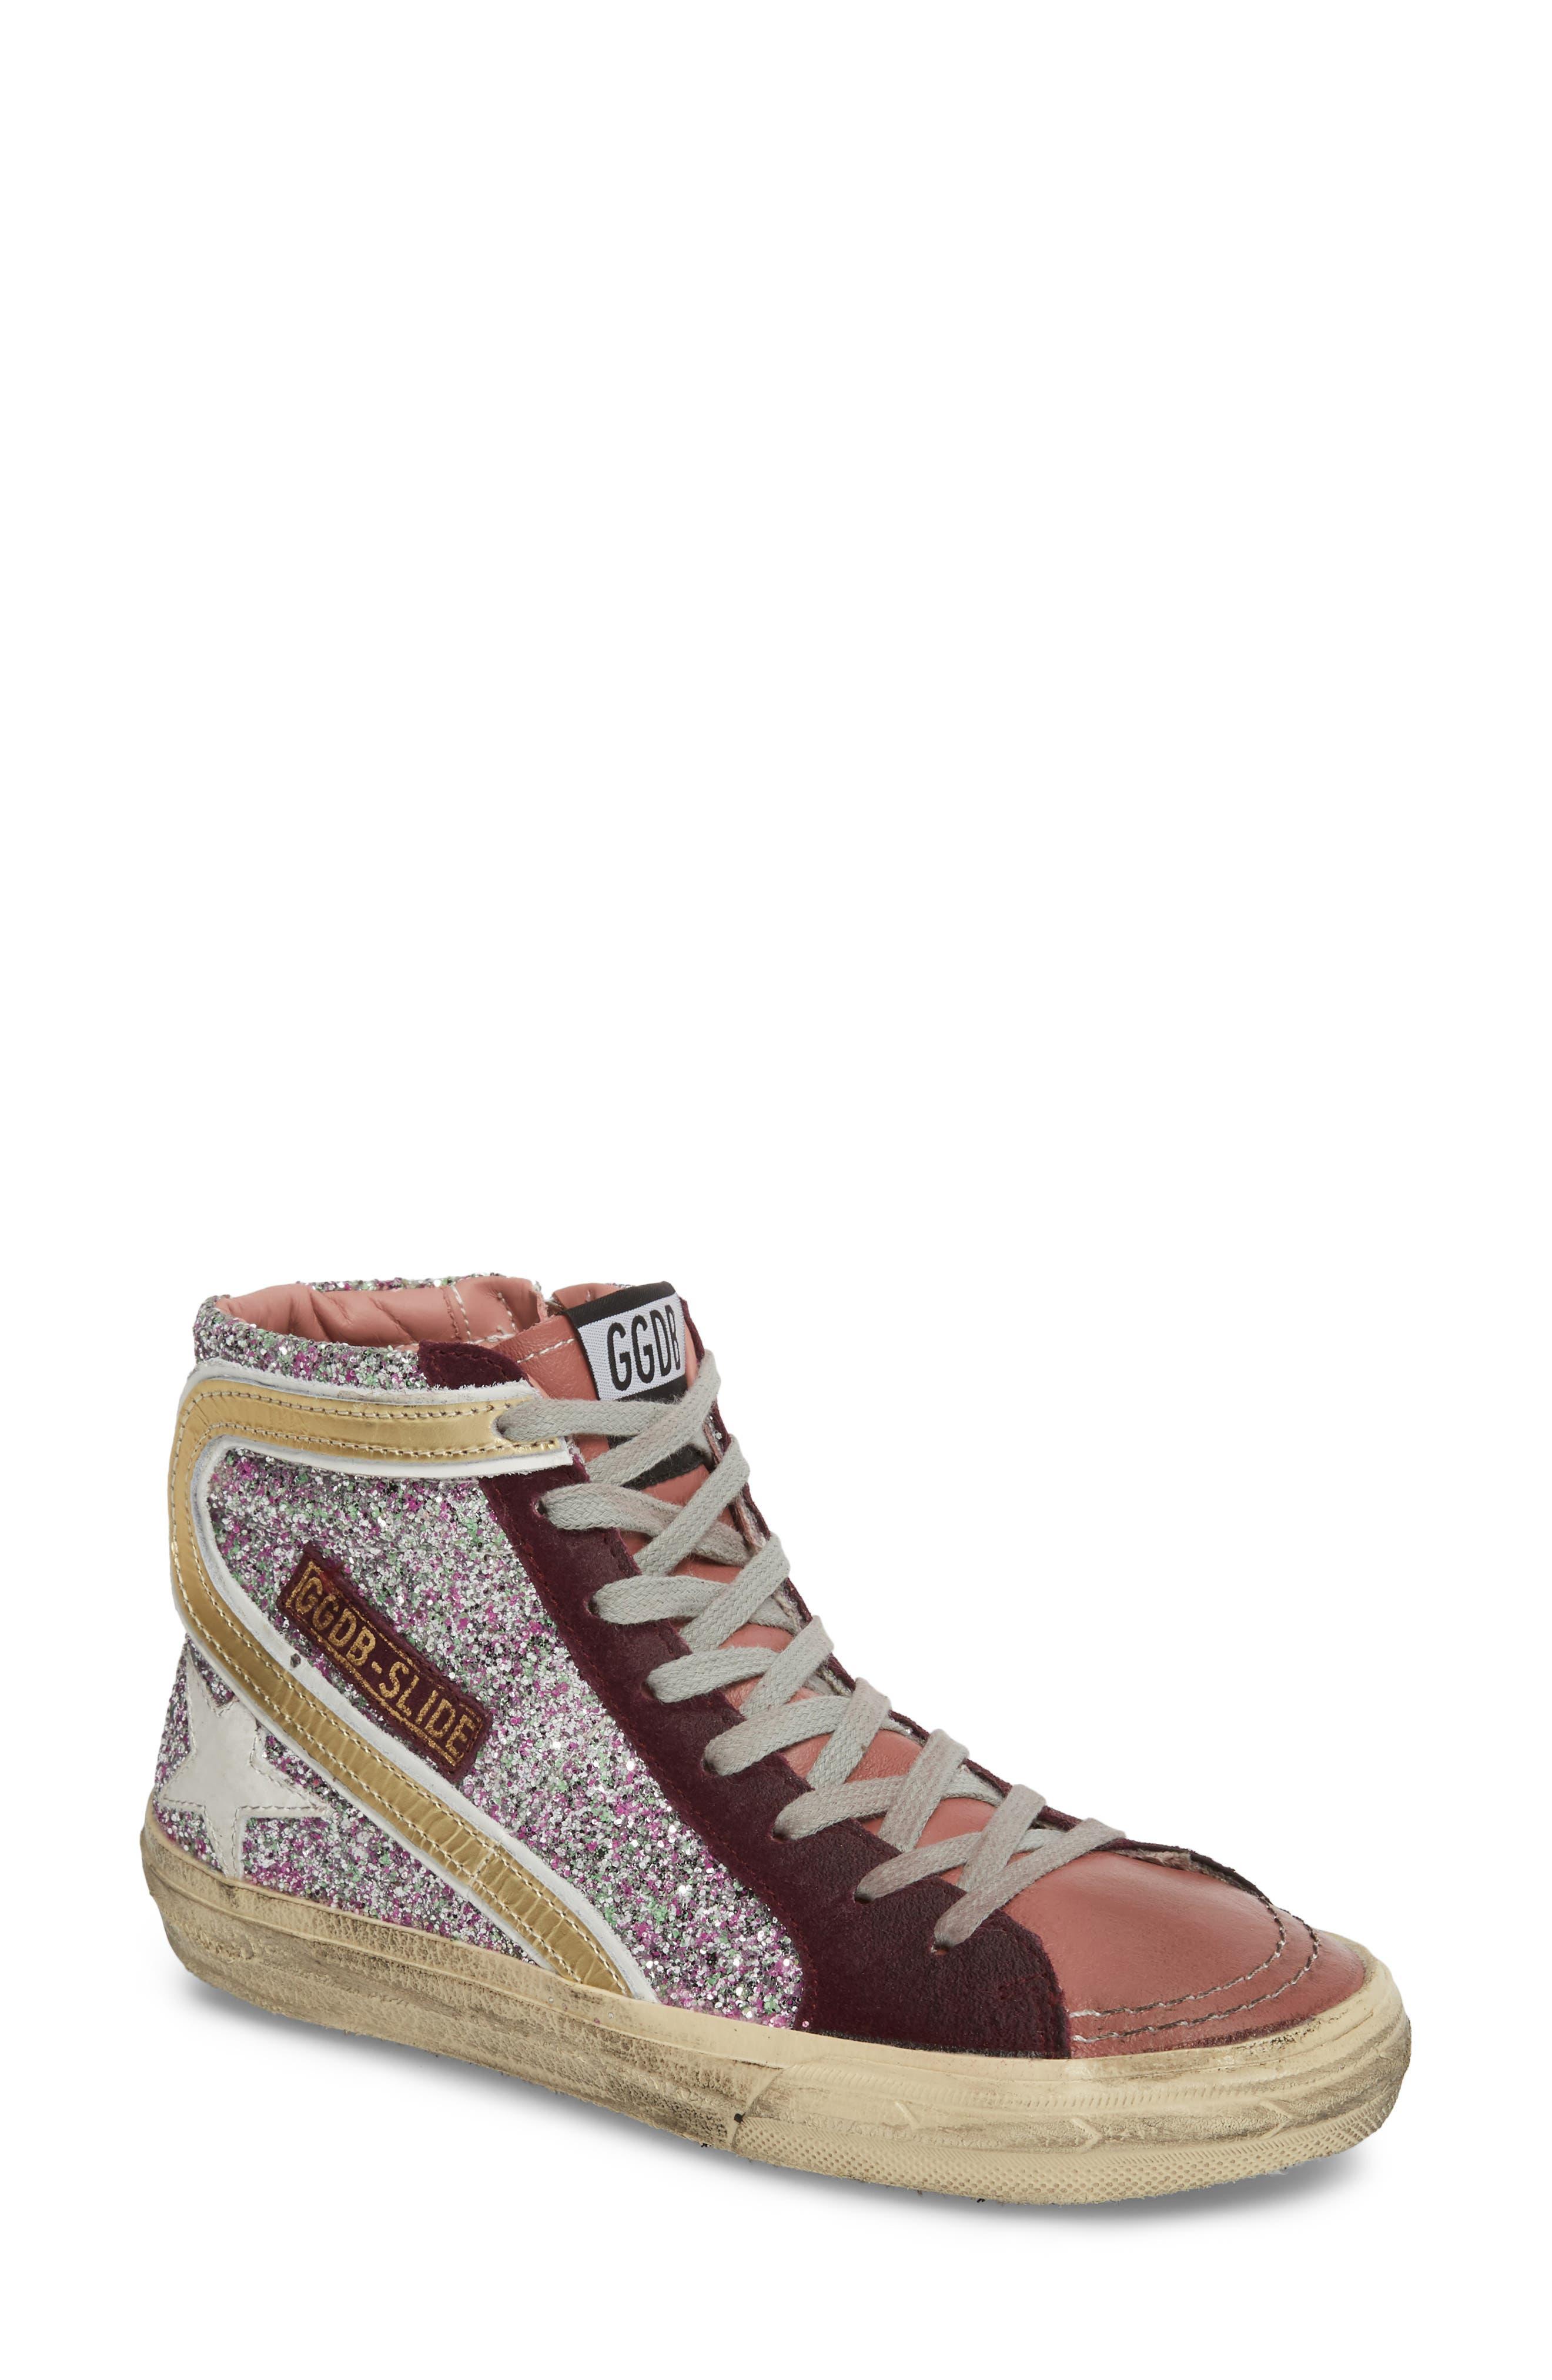 Slide High Top Sneaker,                             Main thumbnail 1, color,                             Bordeaux / Pink/ Gold